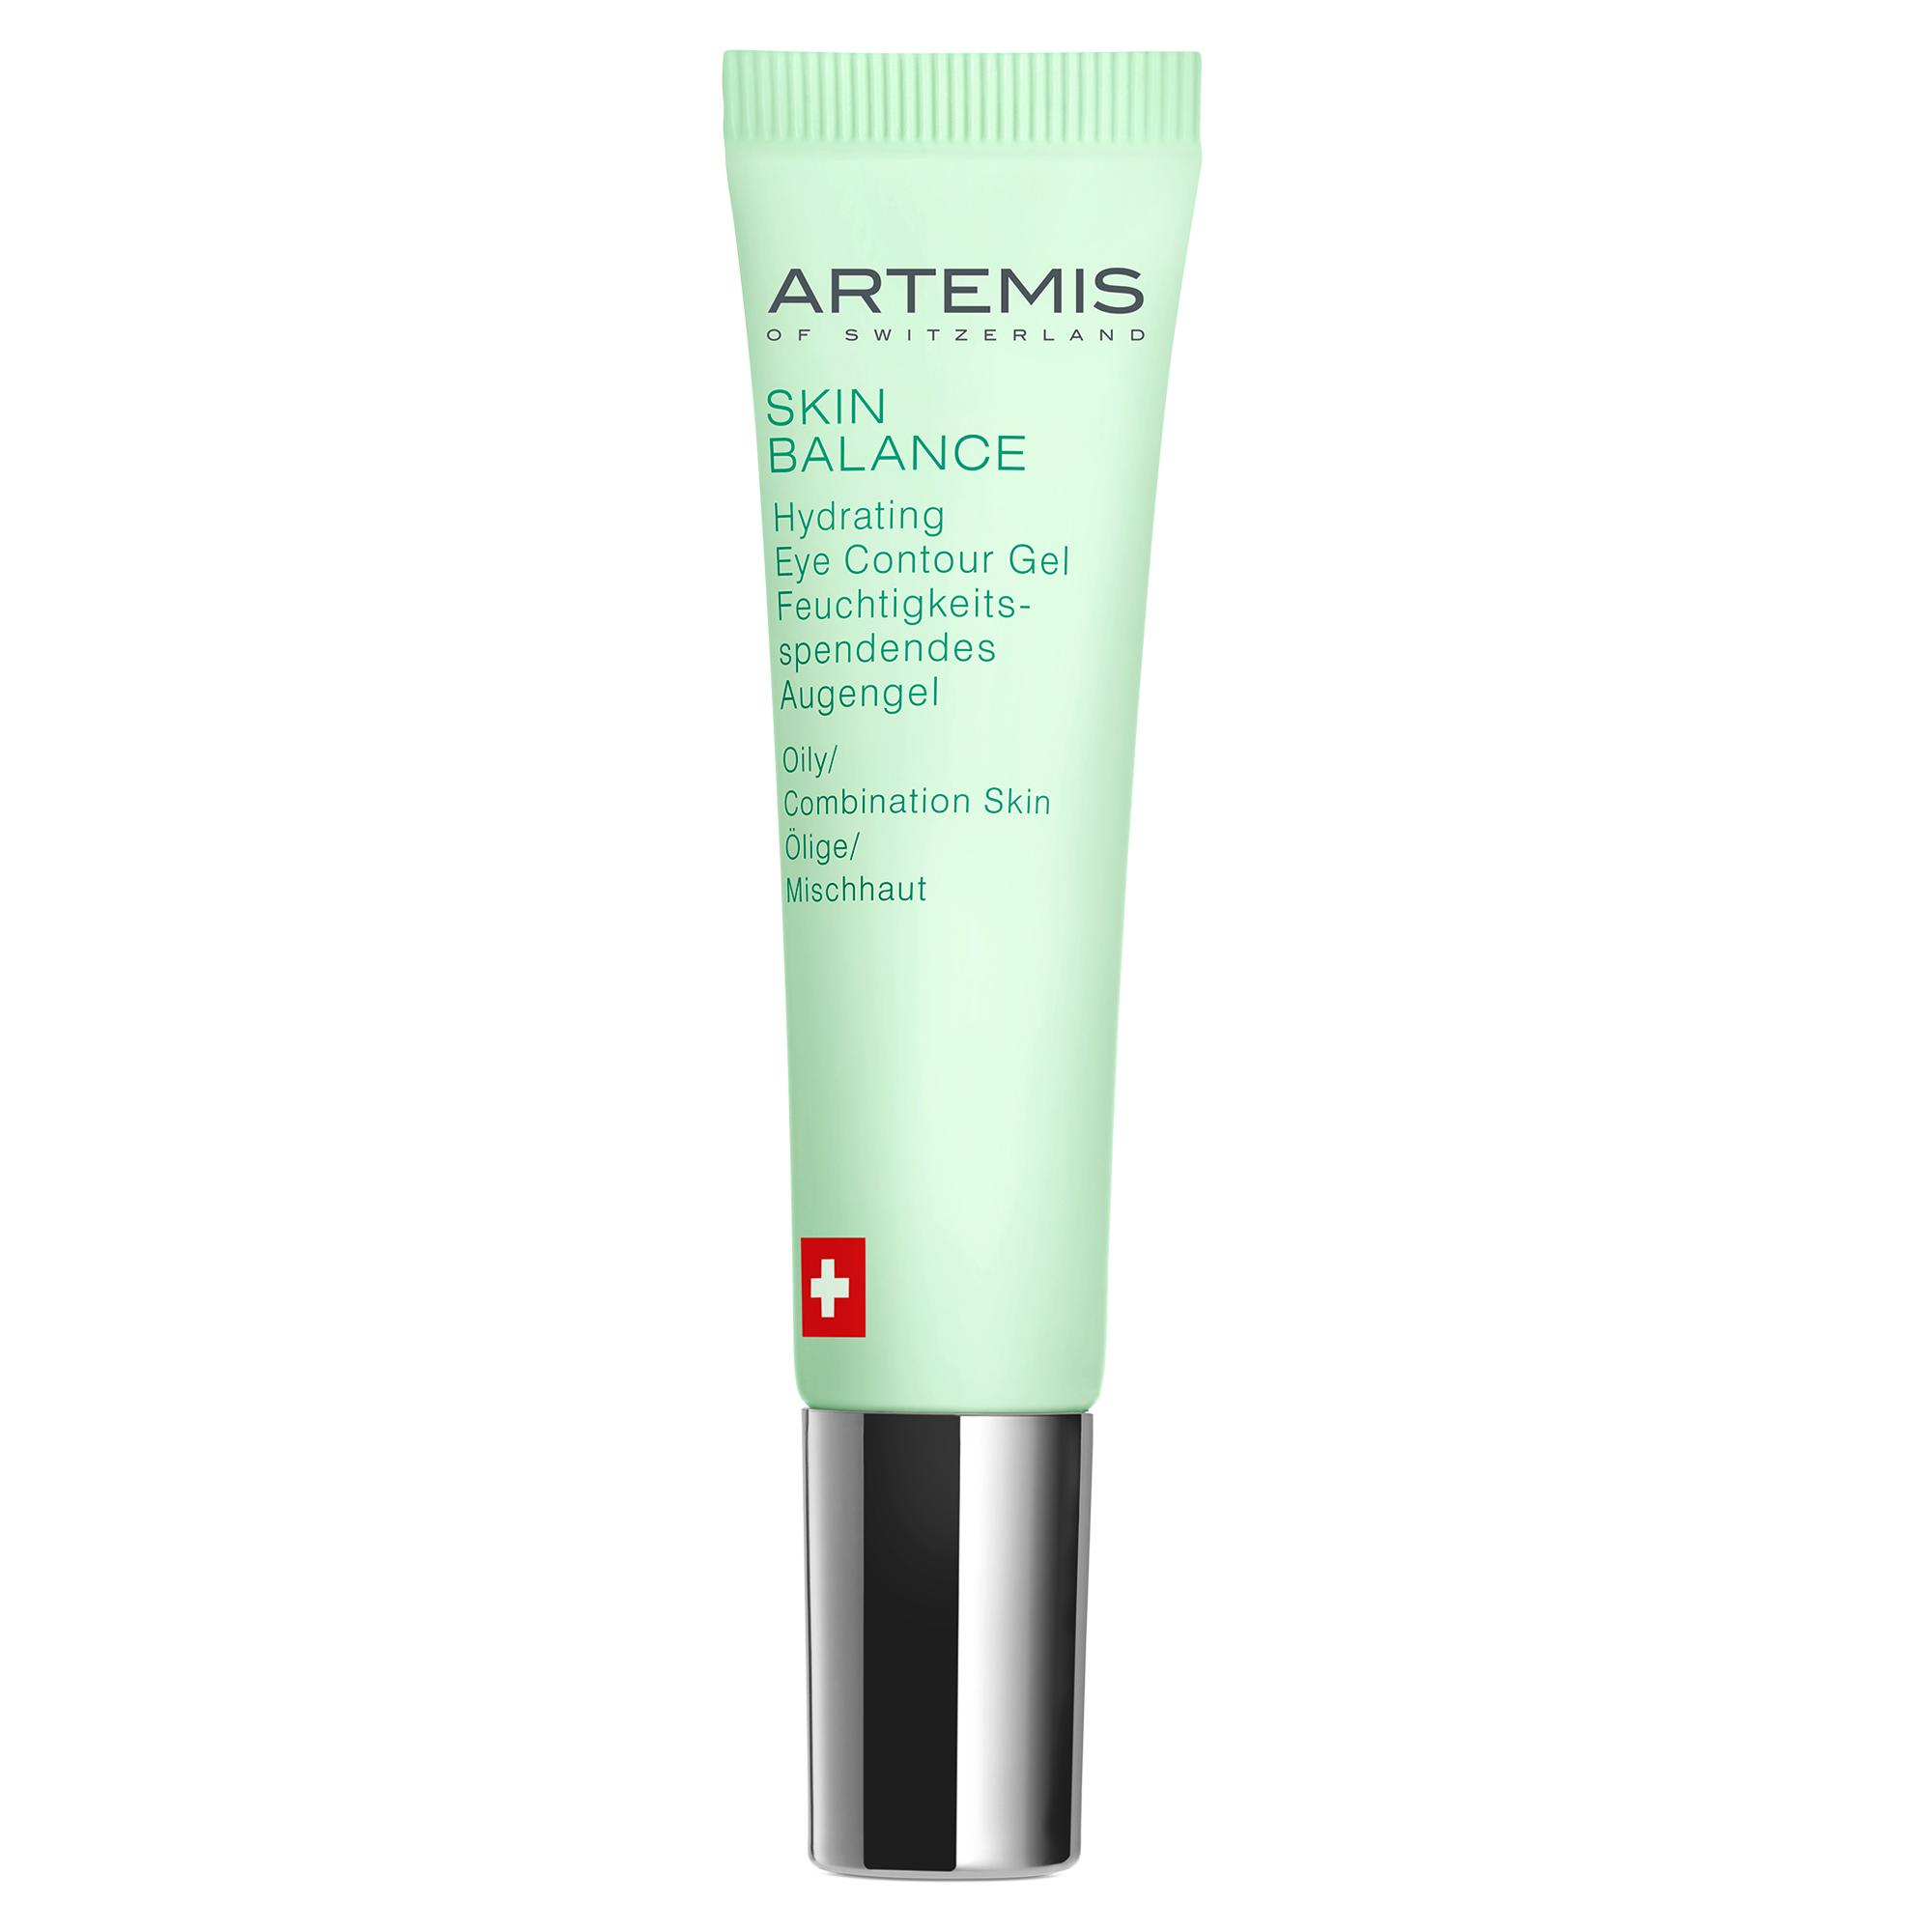 Artemis Skin Balance Hydrating Eye Contour Gel 15ml